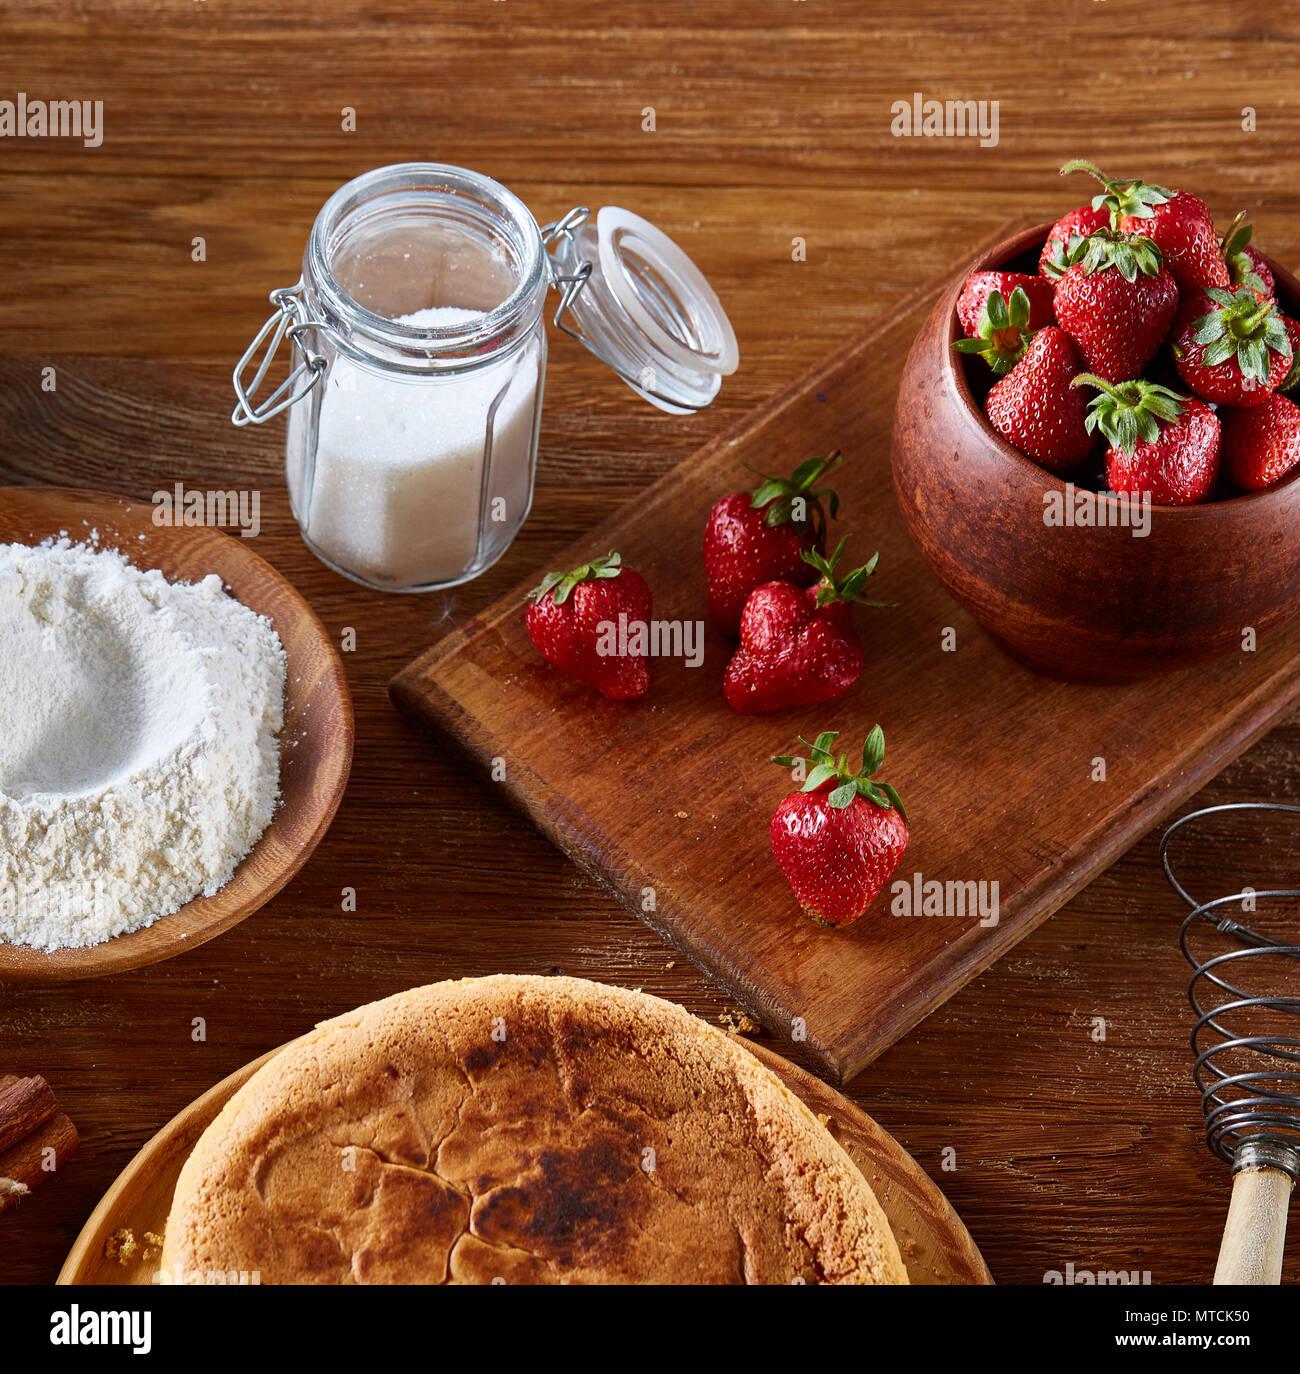 Receta De Tarta De Fresas Fresas Frescas Harina Y Azúcar